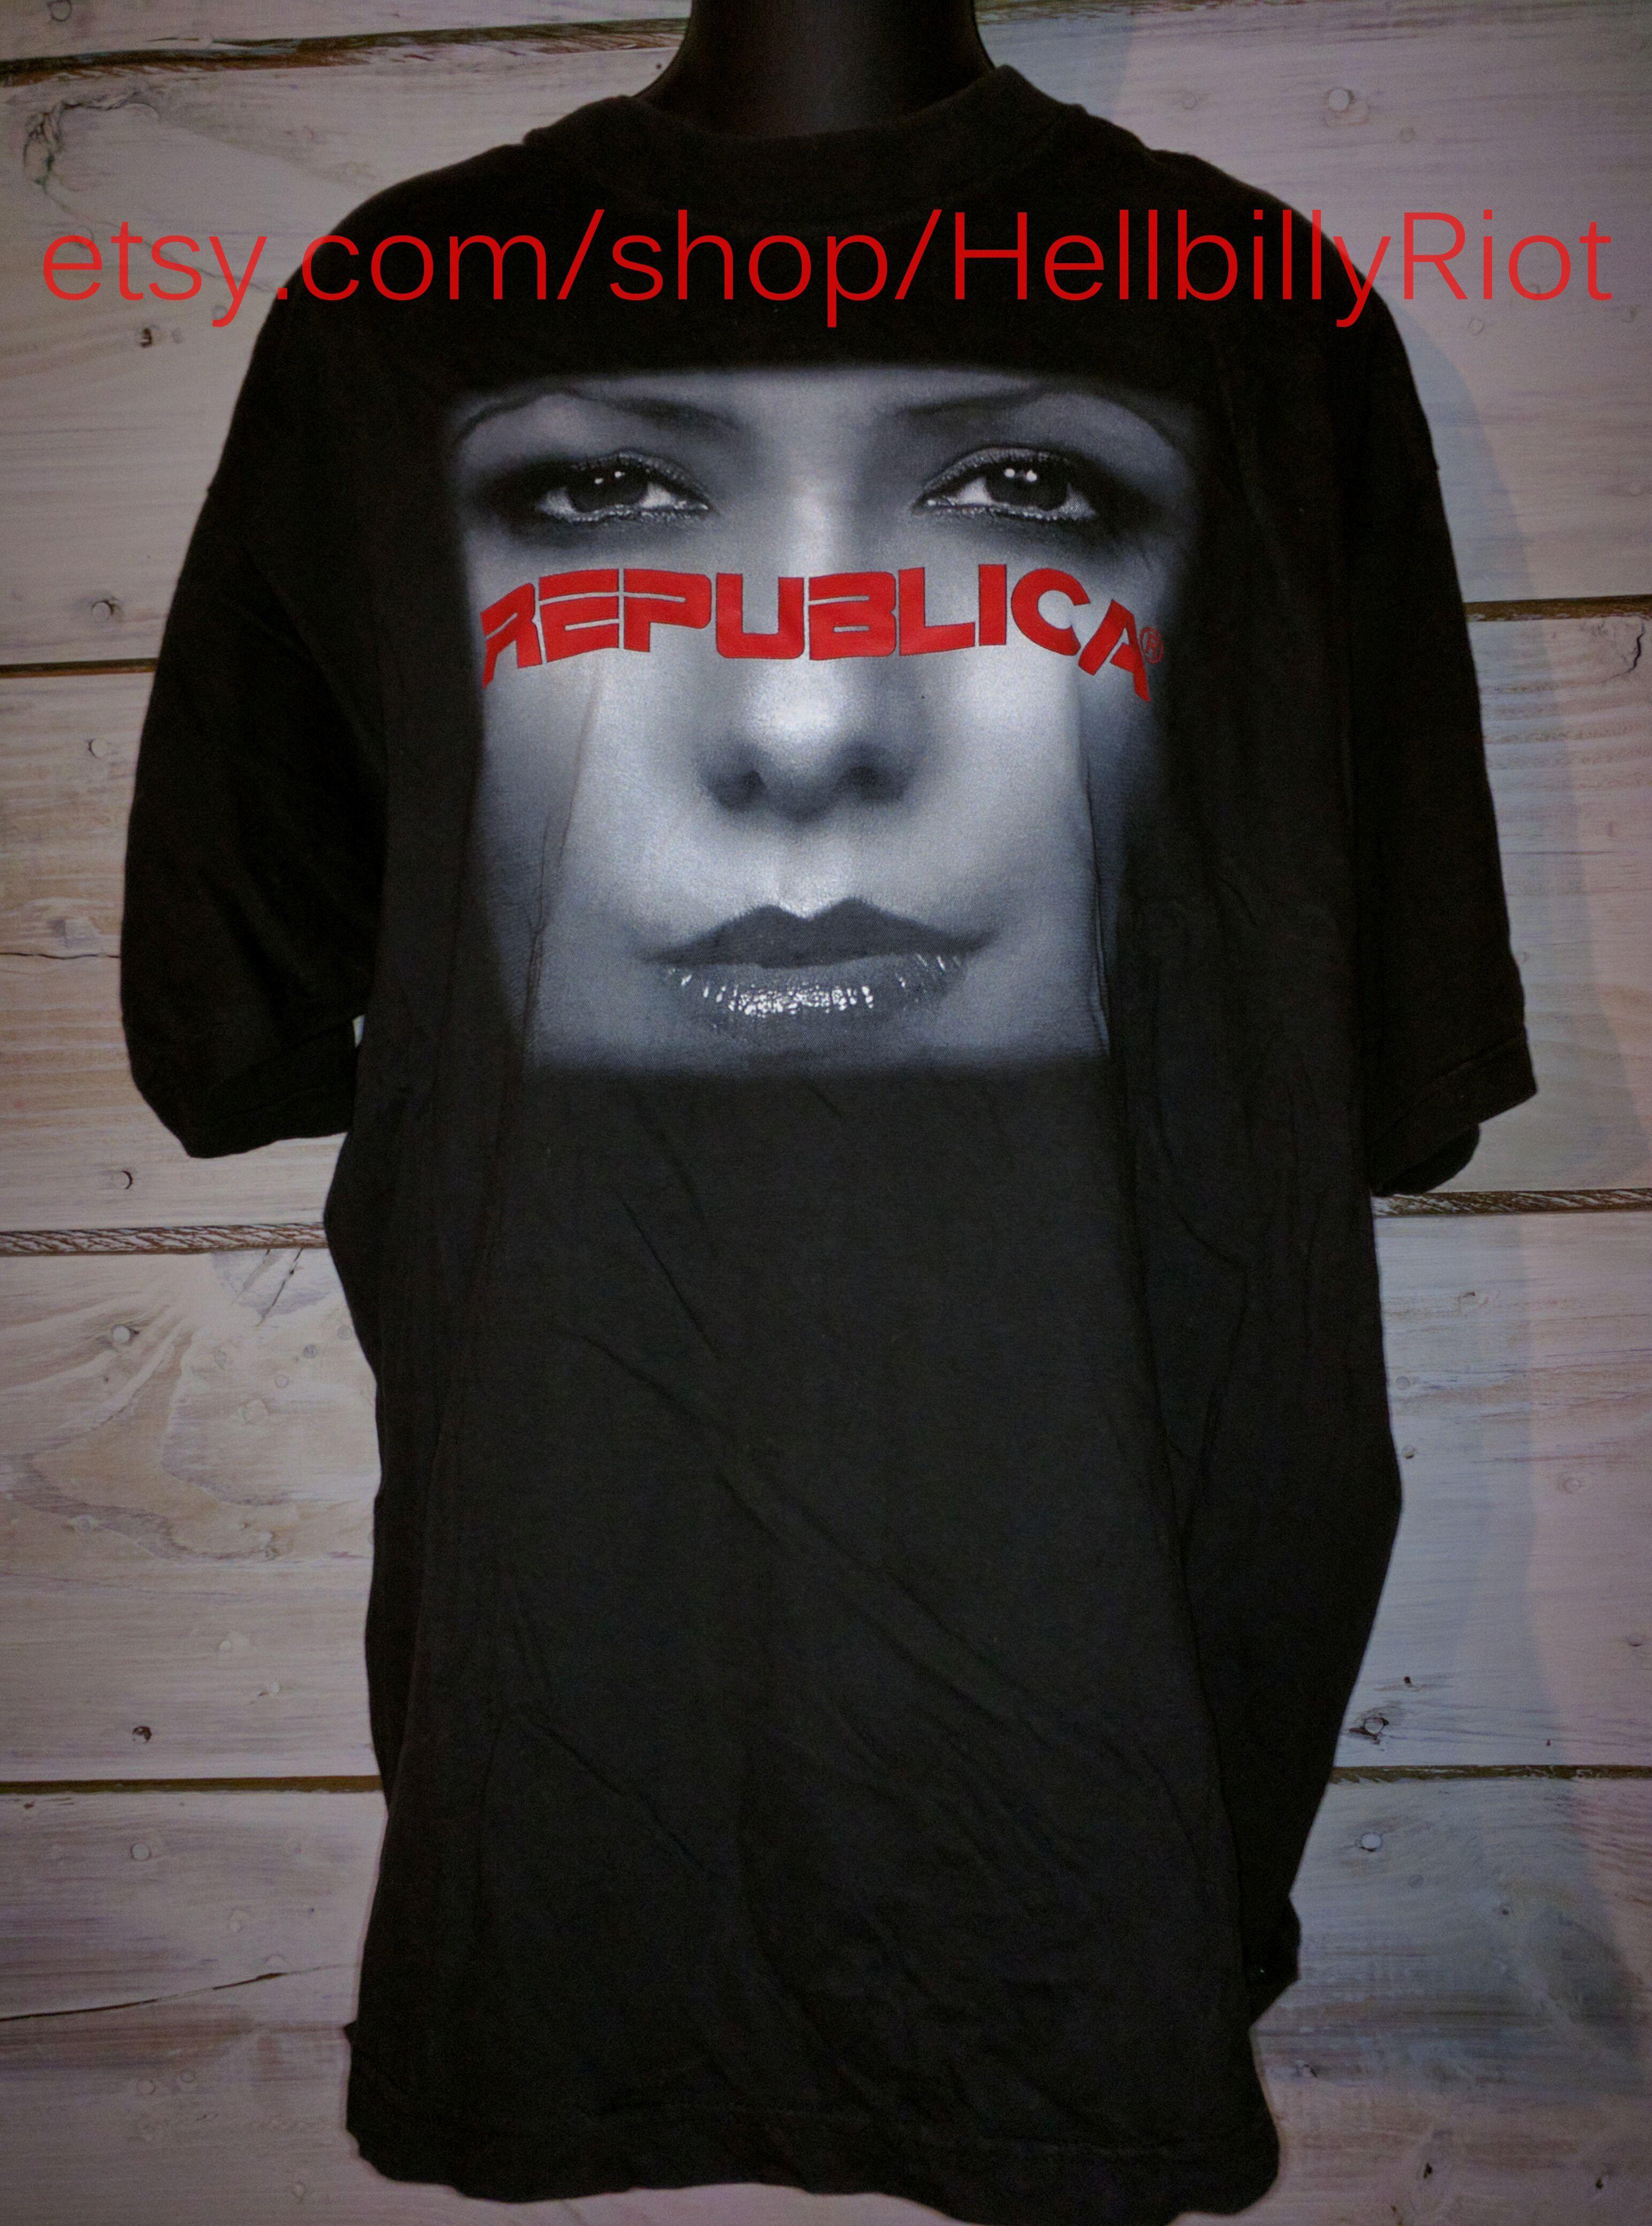 Danny zuko black t shirt - 90 S Britpop Republica Concert T Shirt Europop British Band Rare Vintage Hardcore T Shirt Hxc New